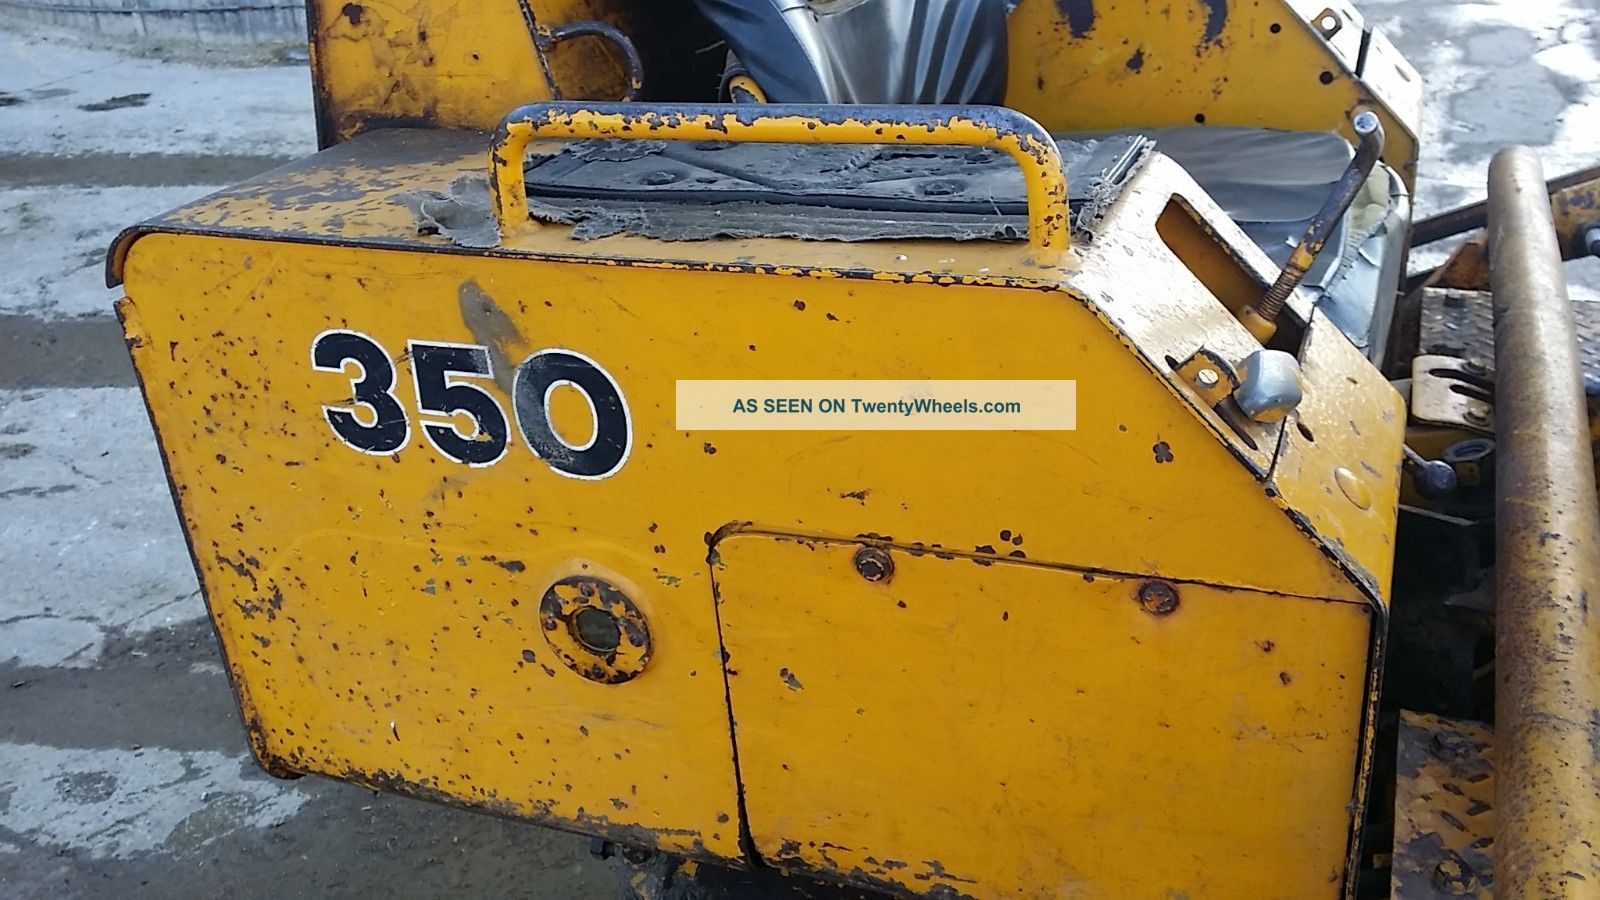 1970 John Deere 350 Track Crawler Dozer Construction Machine